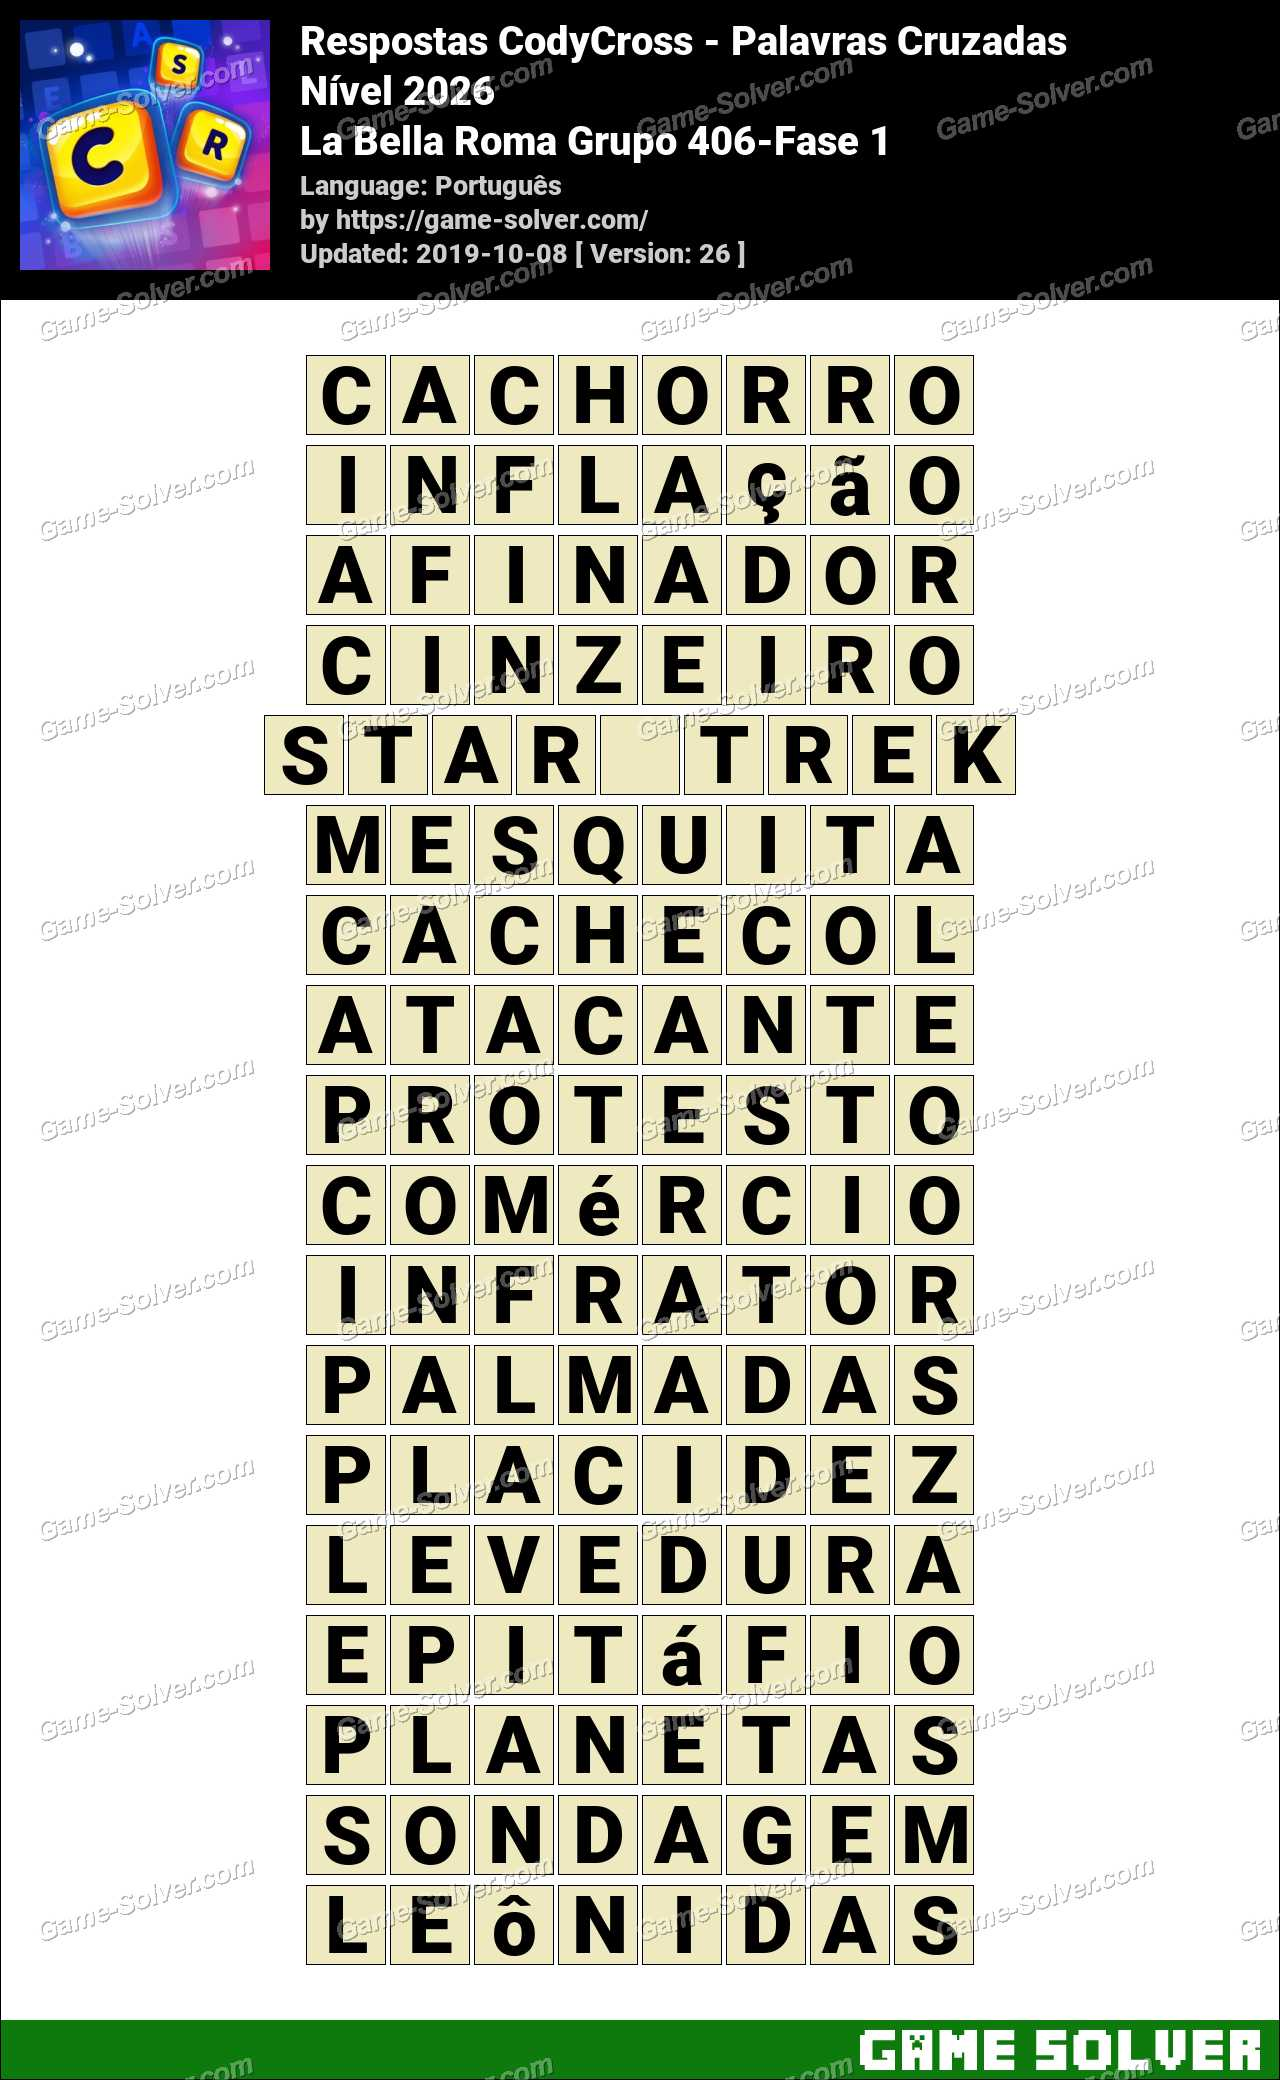 Respostas CodyCross La Bella Roma Grupo 406-Fase 1